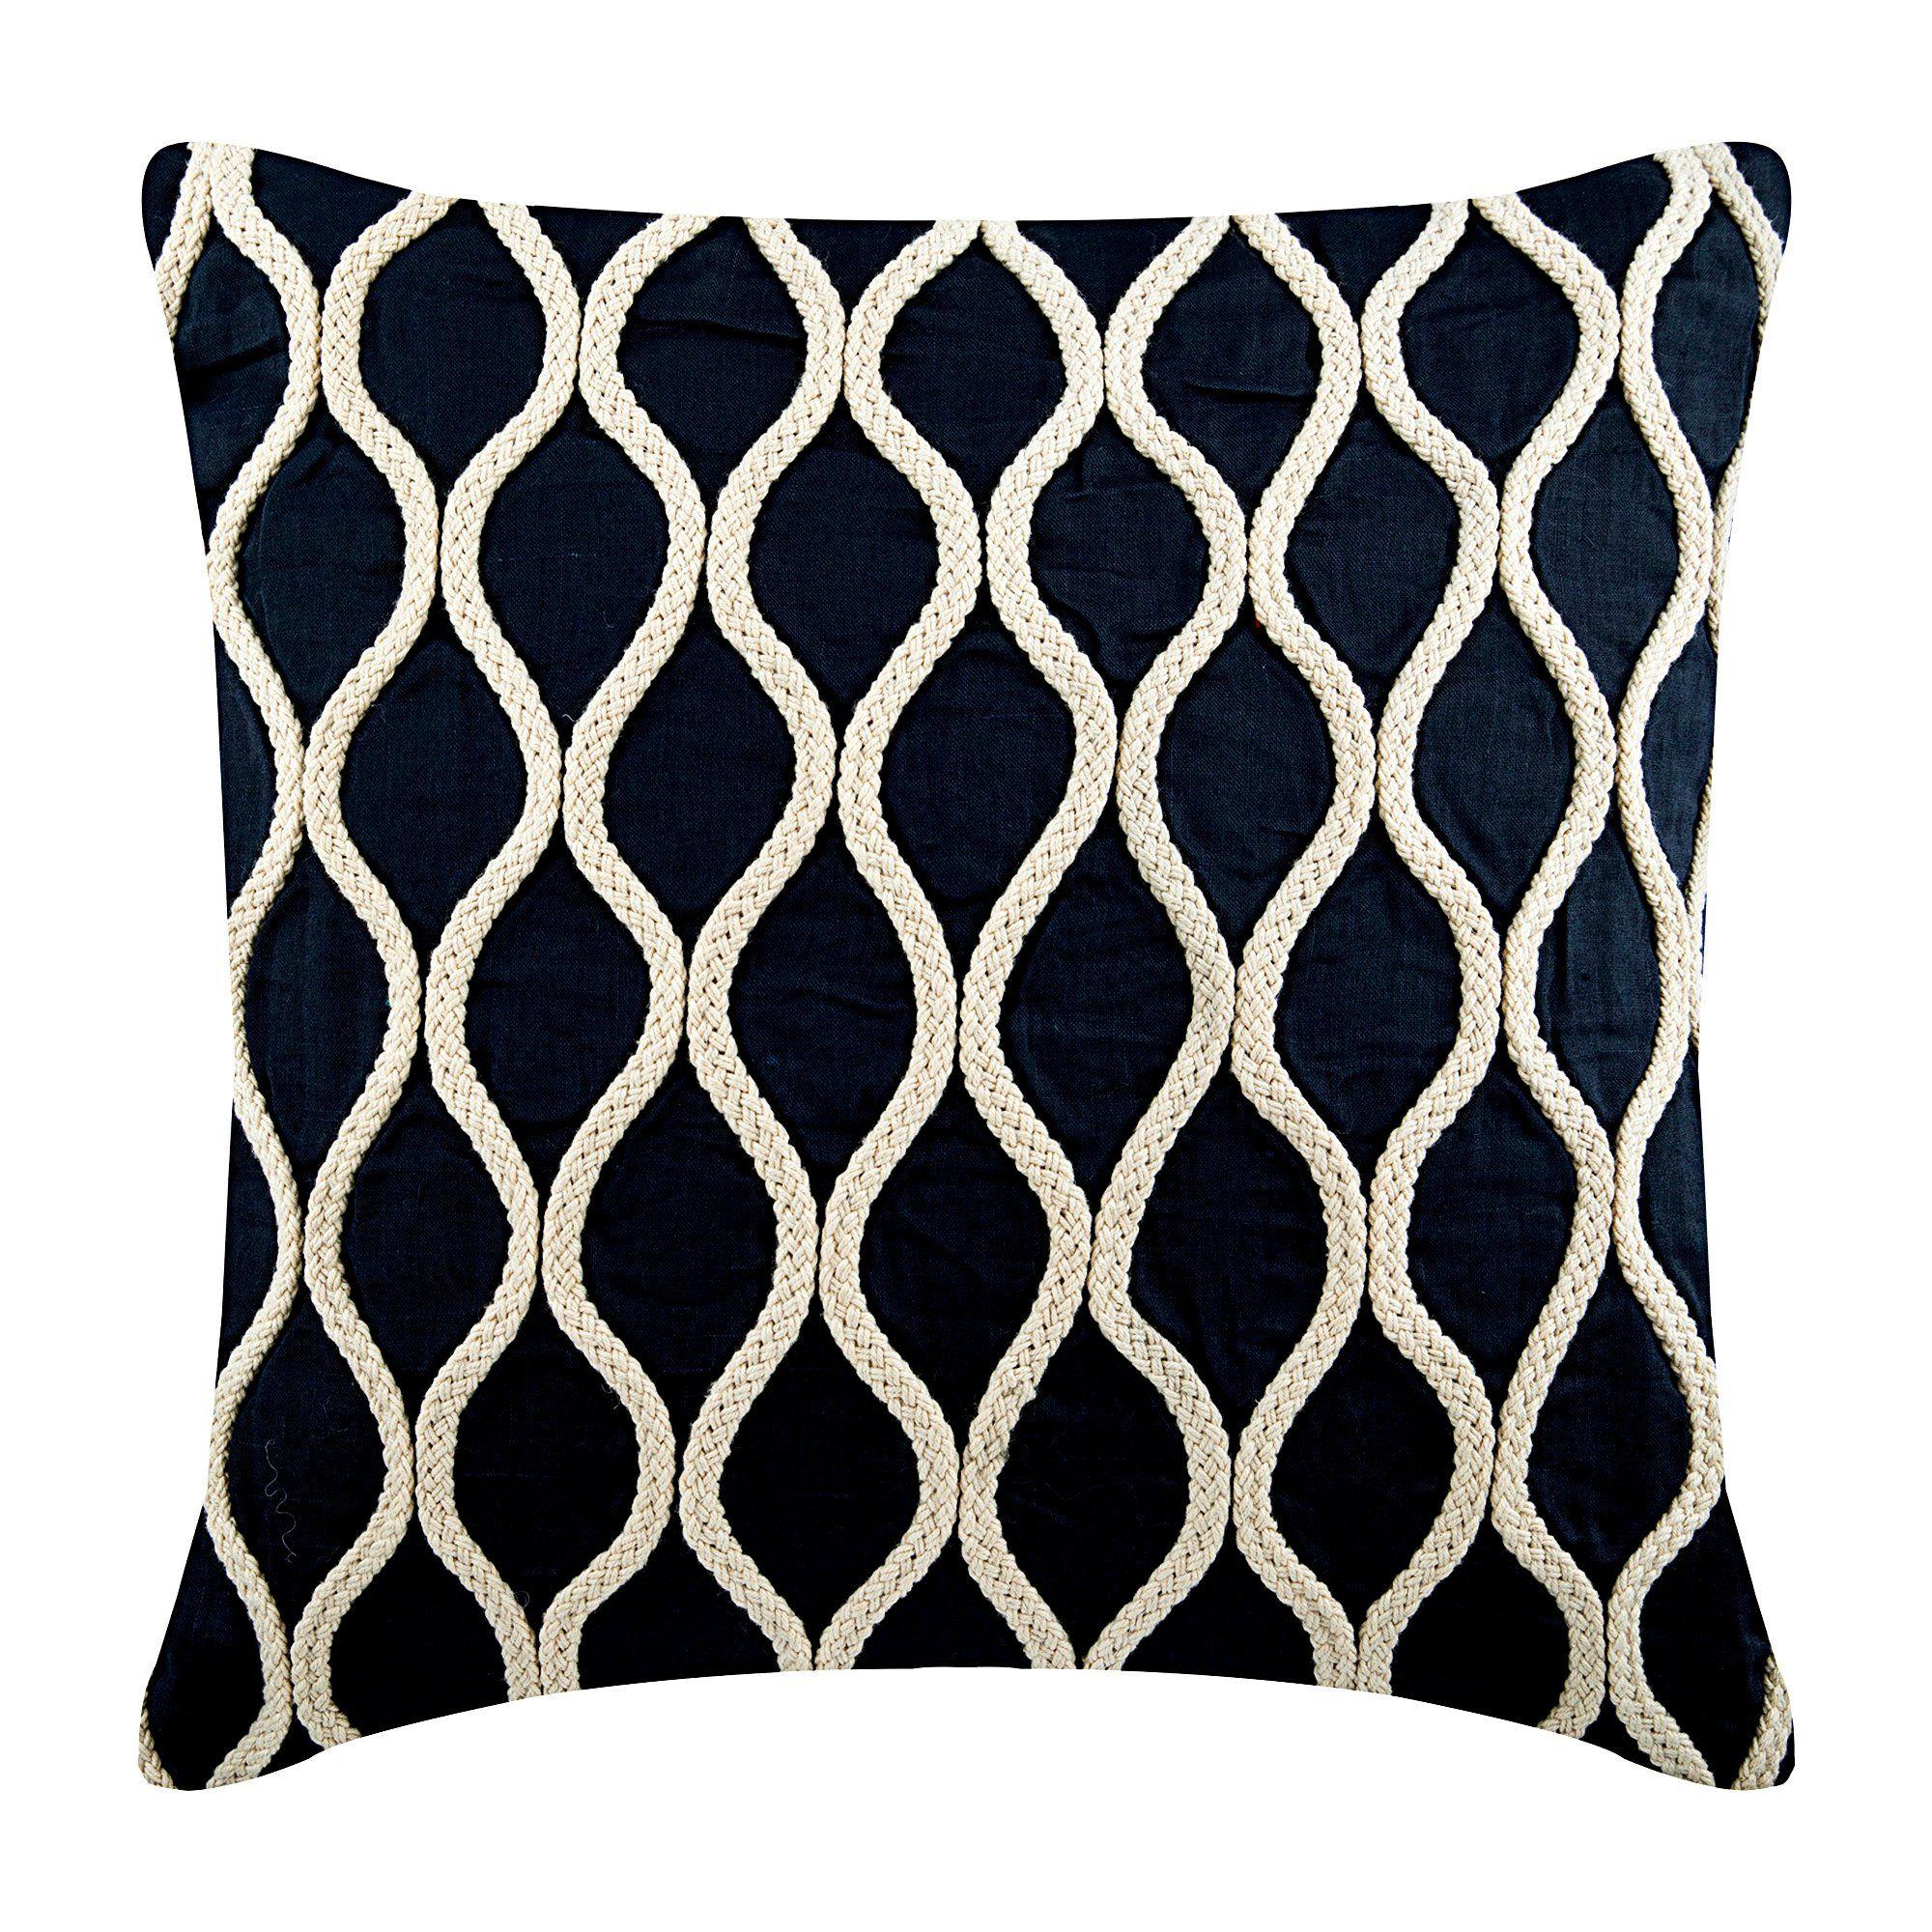 Luxury Navy Blue Decorative Pillows Cover 20 X20 Cotton Linen Pillowcase Square Jute Lattice Trellis Throw Pillows Cover Jute Chorus Https Etsy Me 2rnesm